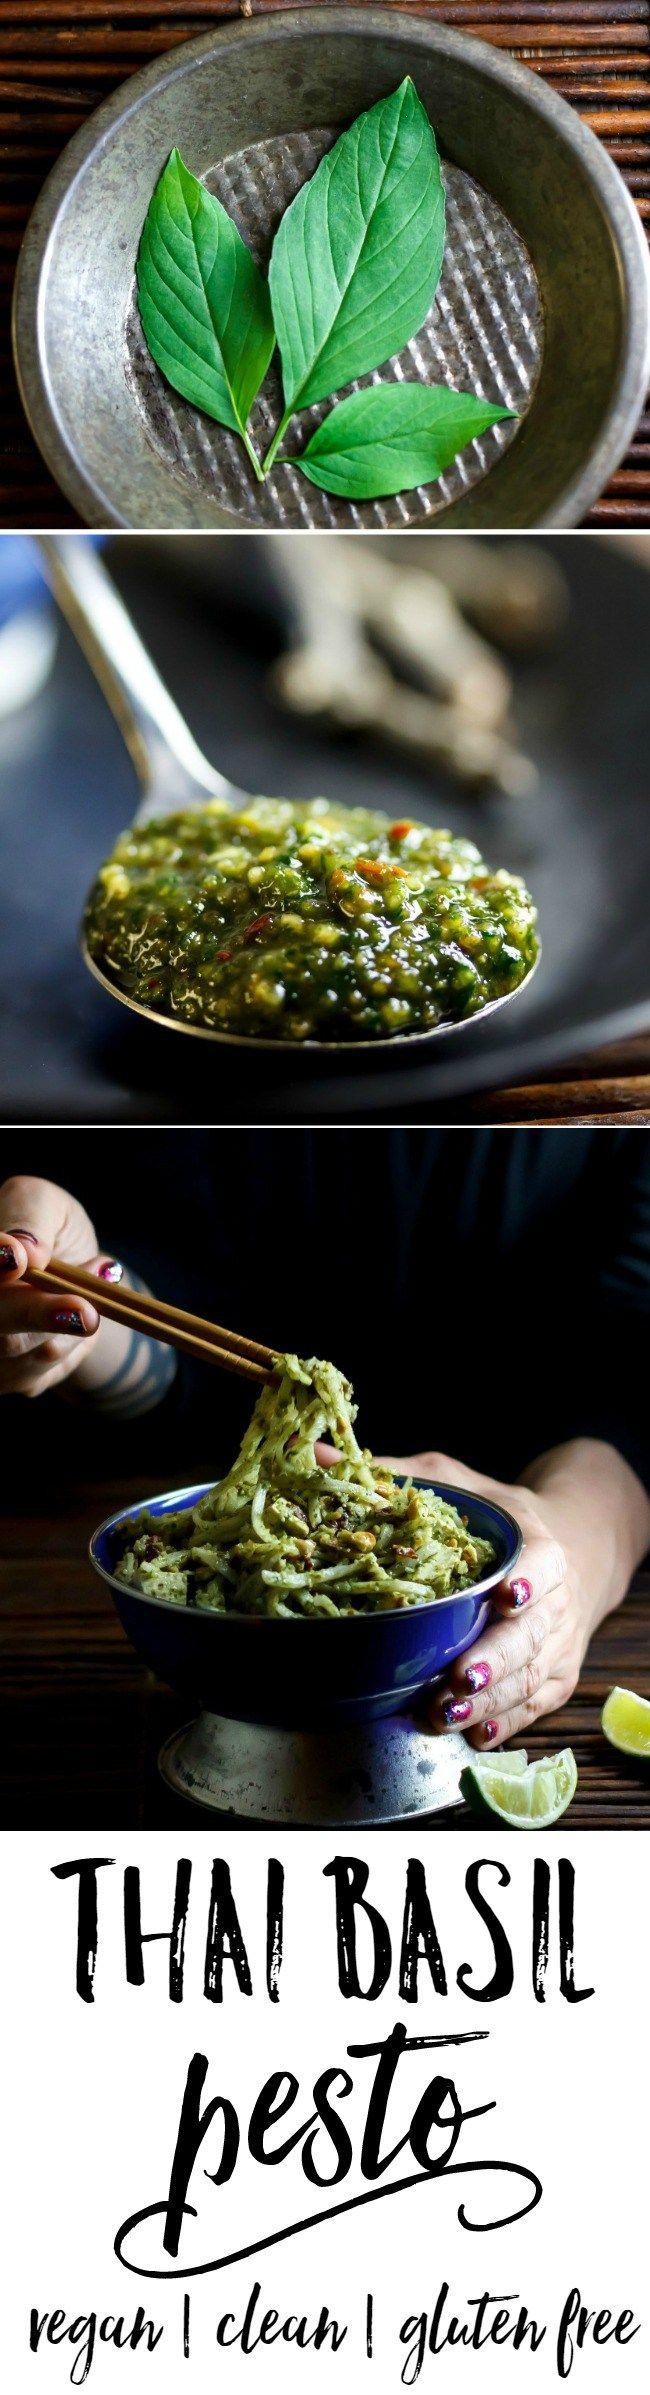 Thai Basil Pesto | eat healthy eat happy.com